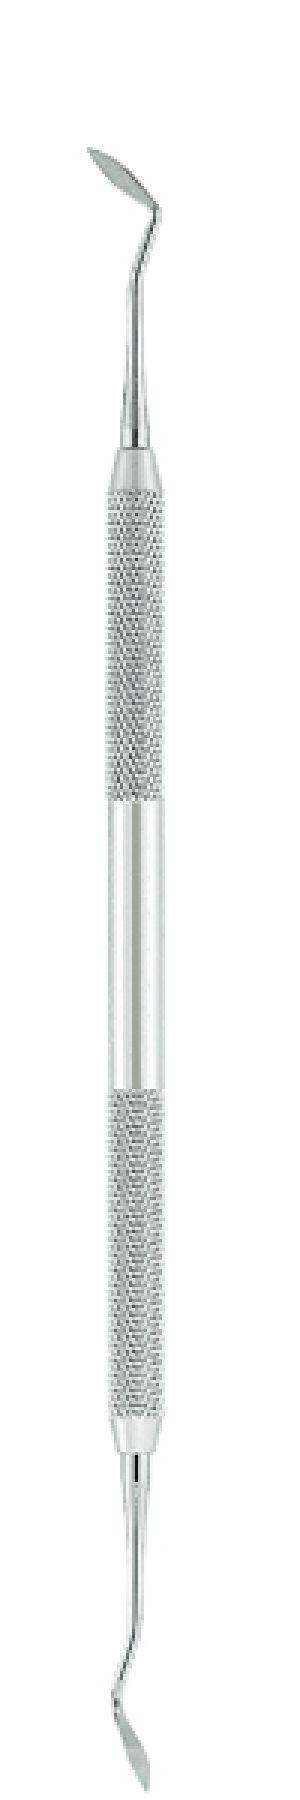 MI-73-104 Dental Wax & Modelling Carver